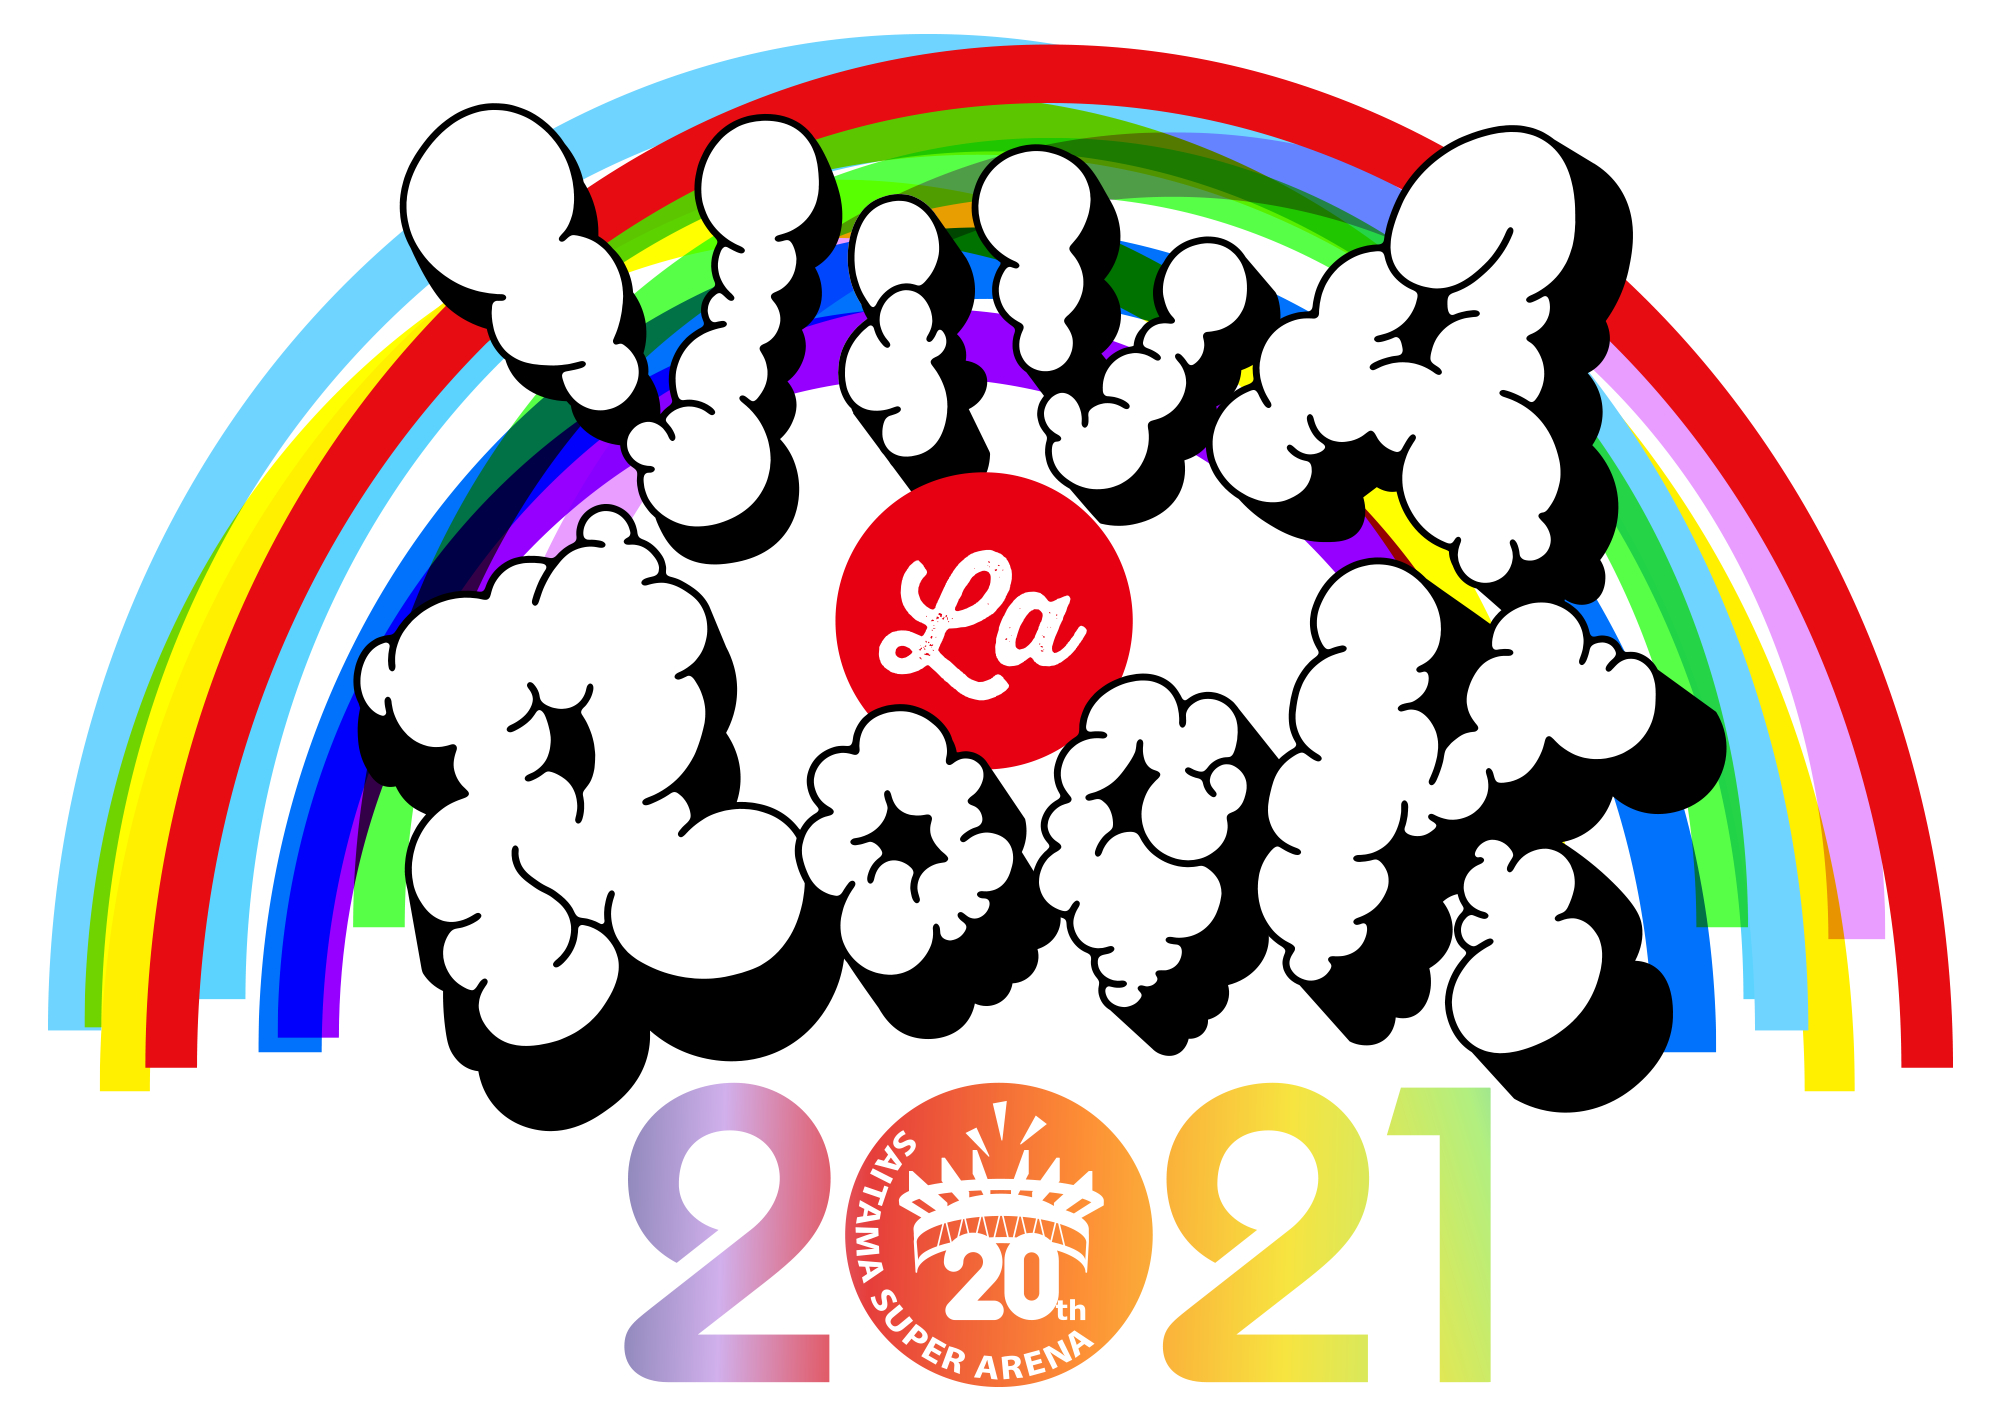 『VIVA LA ROCK 2021』ロゴ